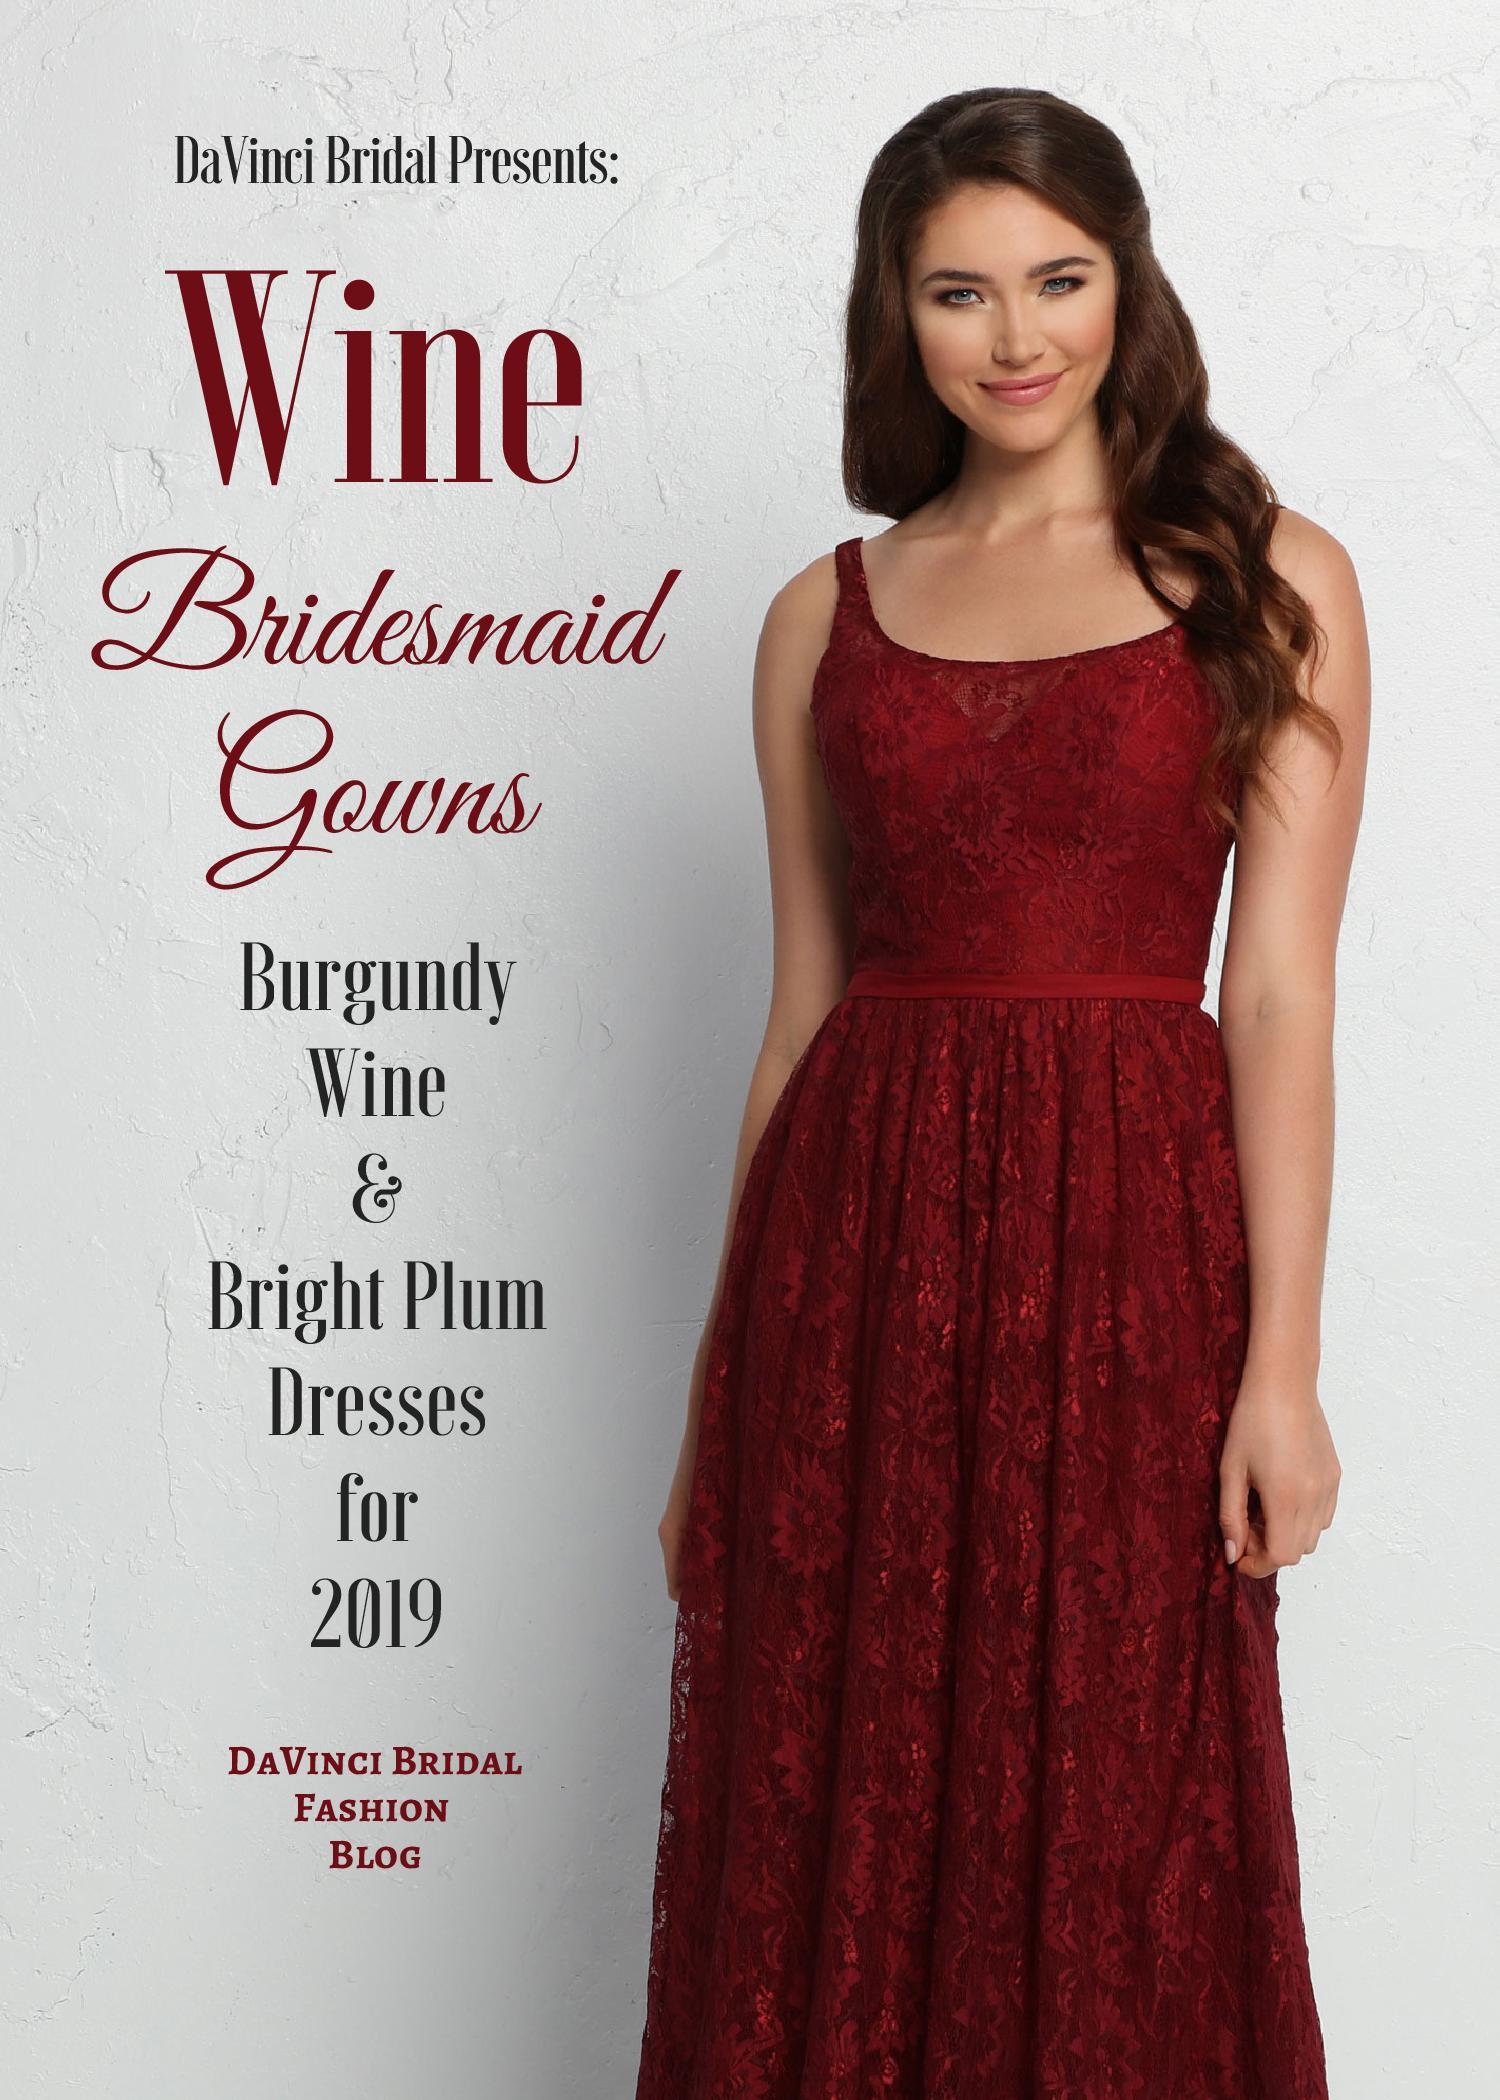 9030a4258c0 2019 Wine Bridesmaid Dresses in Burgundy